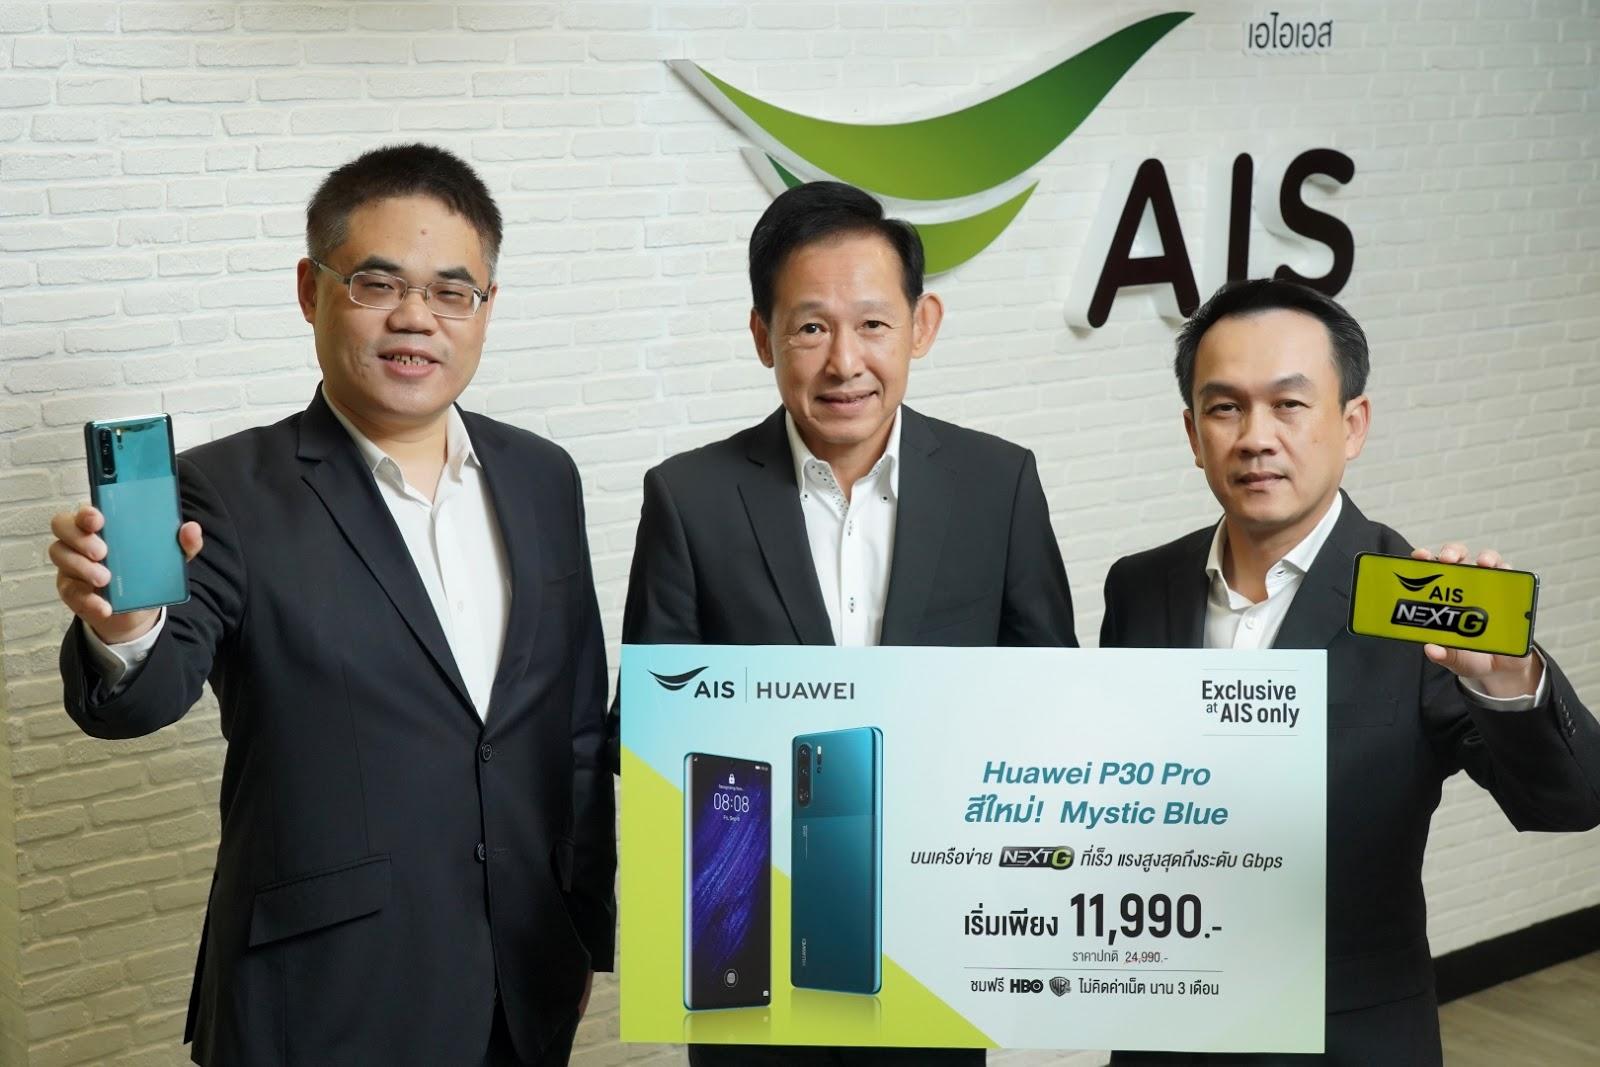 HUAWEI จับมือ AIS วางจำหน่าย HUAWEI P30 Pro สีใหม่ Mystic Blue  เอ็กซ์คลูซีฟ ณ เอไอเอส ช็อป เท่านั้น  ลูกค้าเอไอเอสสามารถเป็นเจ้าของ HUAWEI P30 Pro สี Mystic Blue ได้ในราคาเริ่มต้นเพียง 11,990 บาท